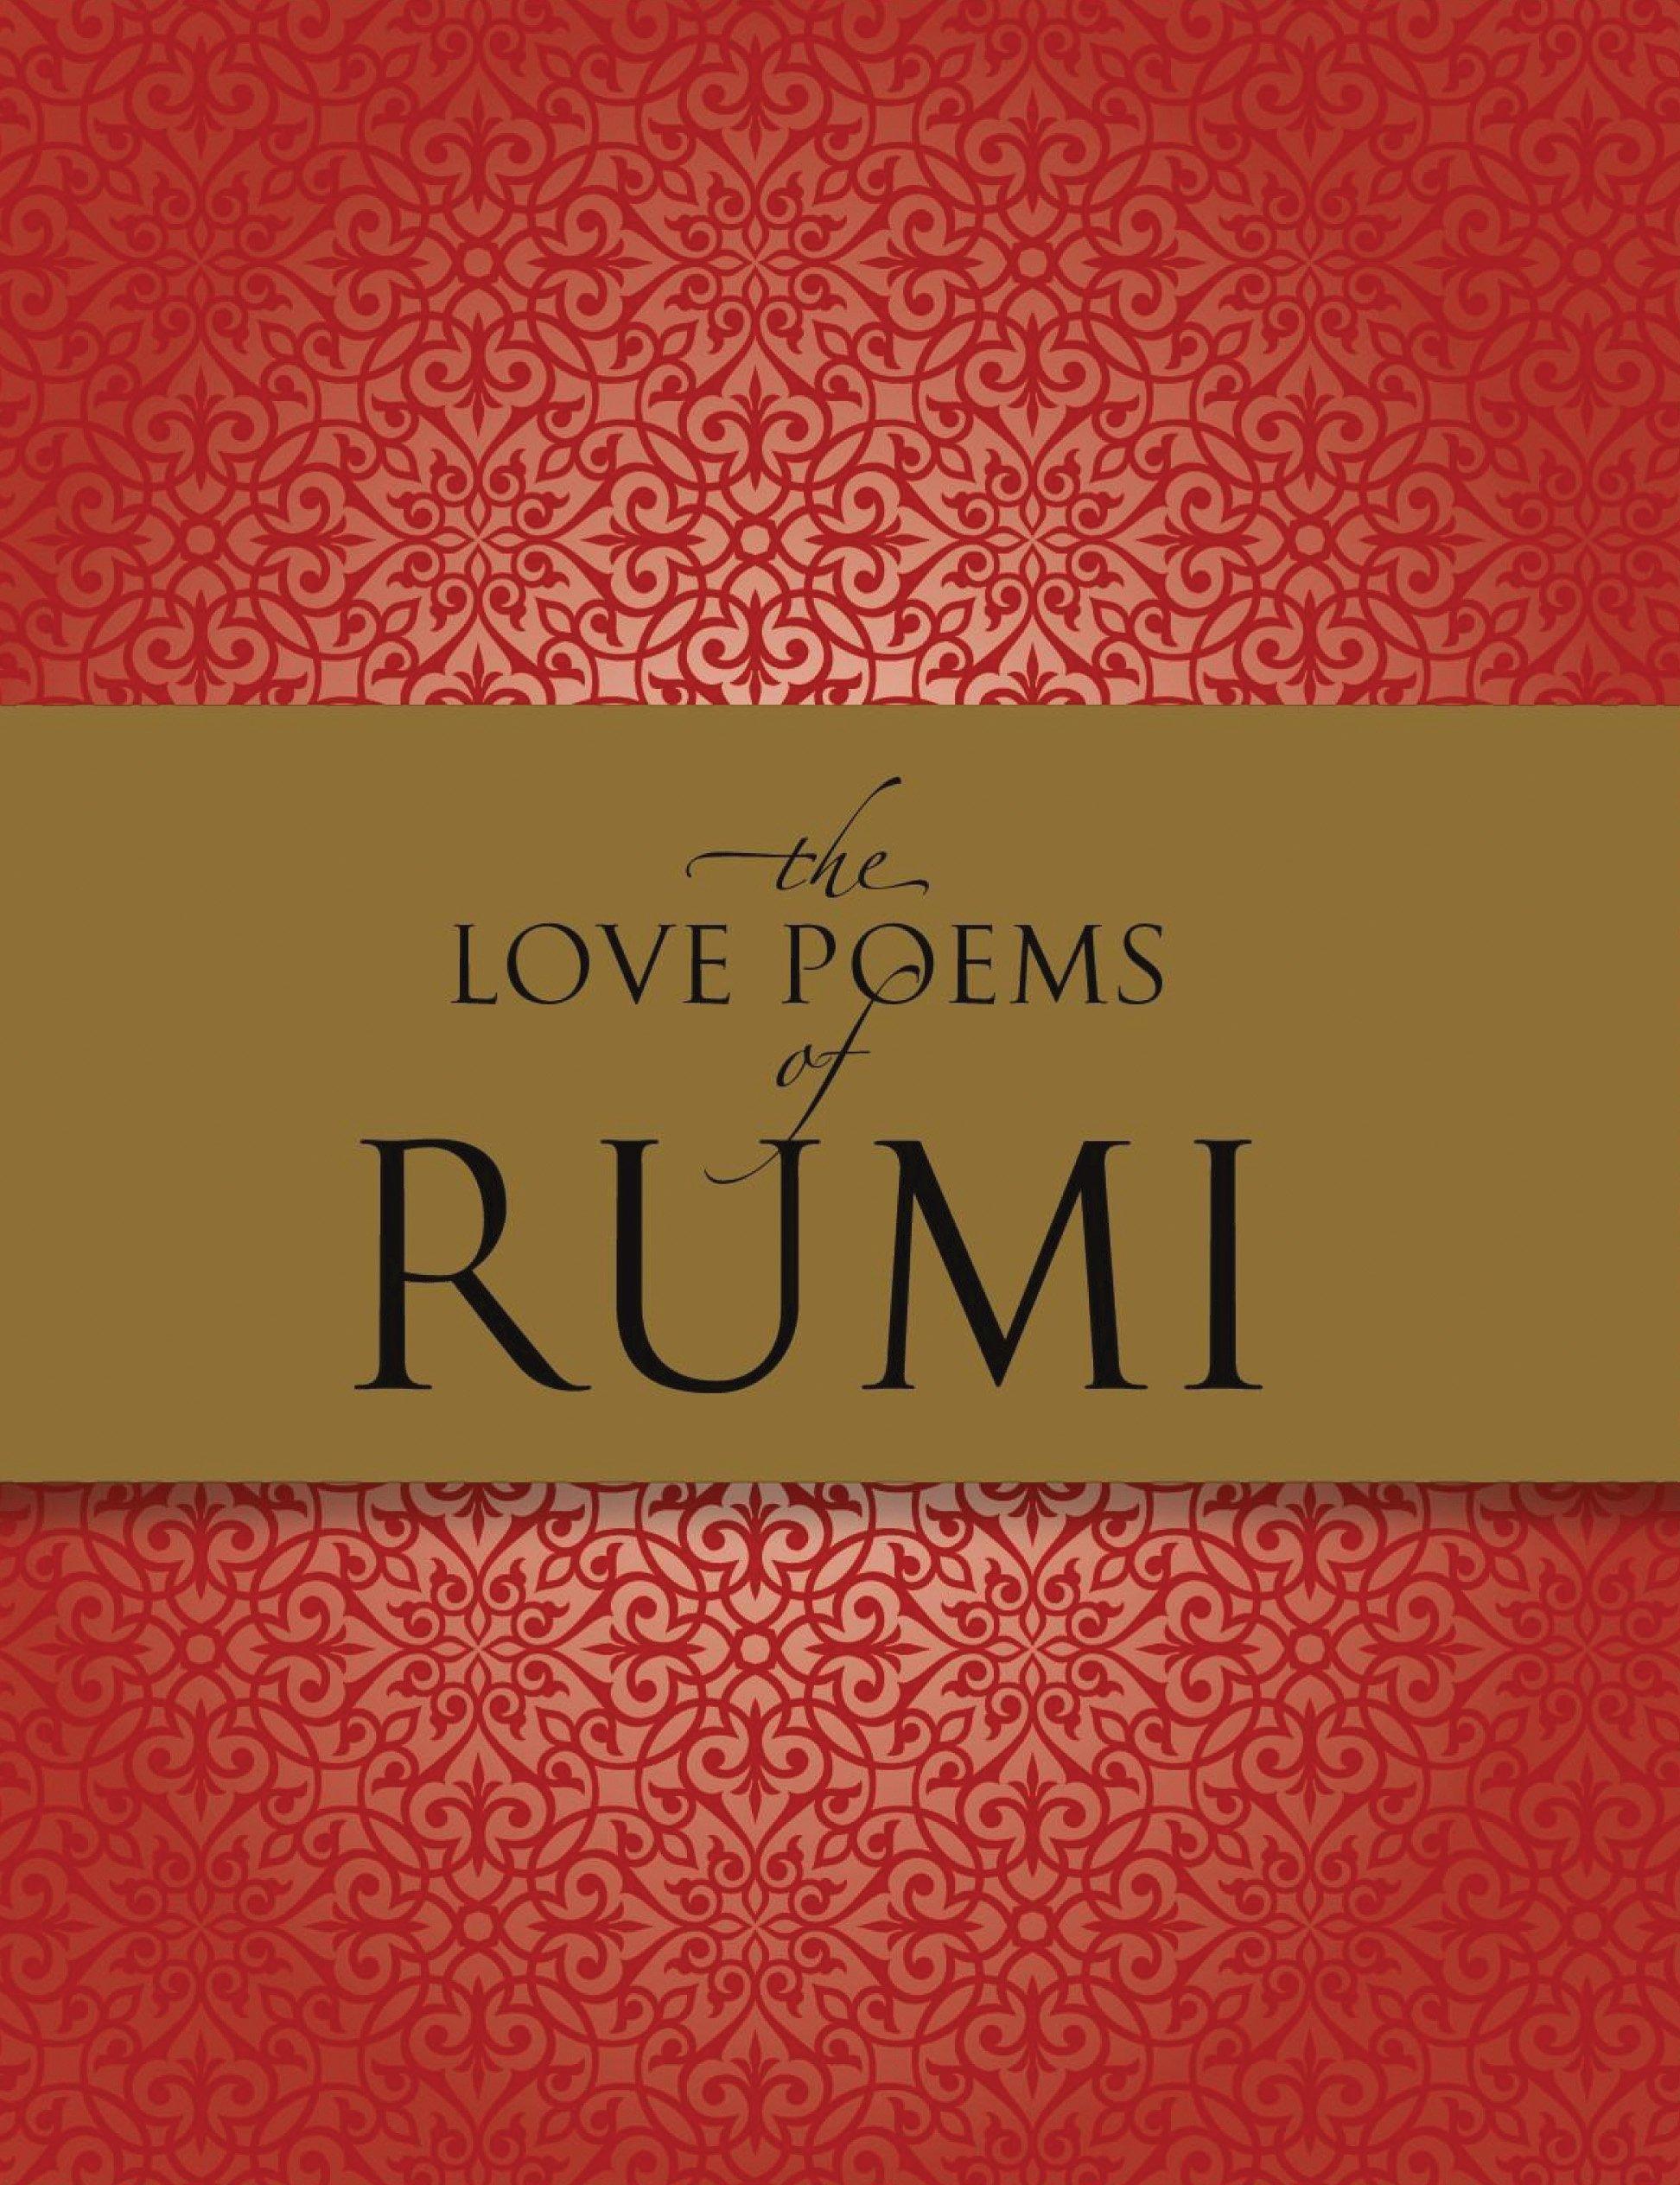 The Love Poems of Rumi: Nader Khalili: 9781577151180: Amazon